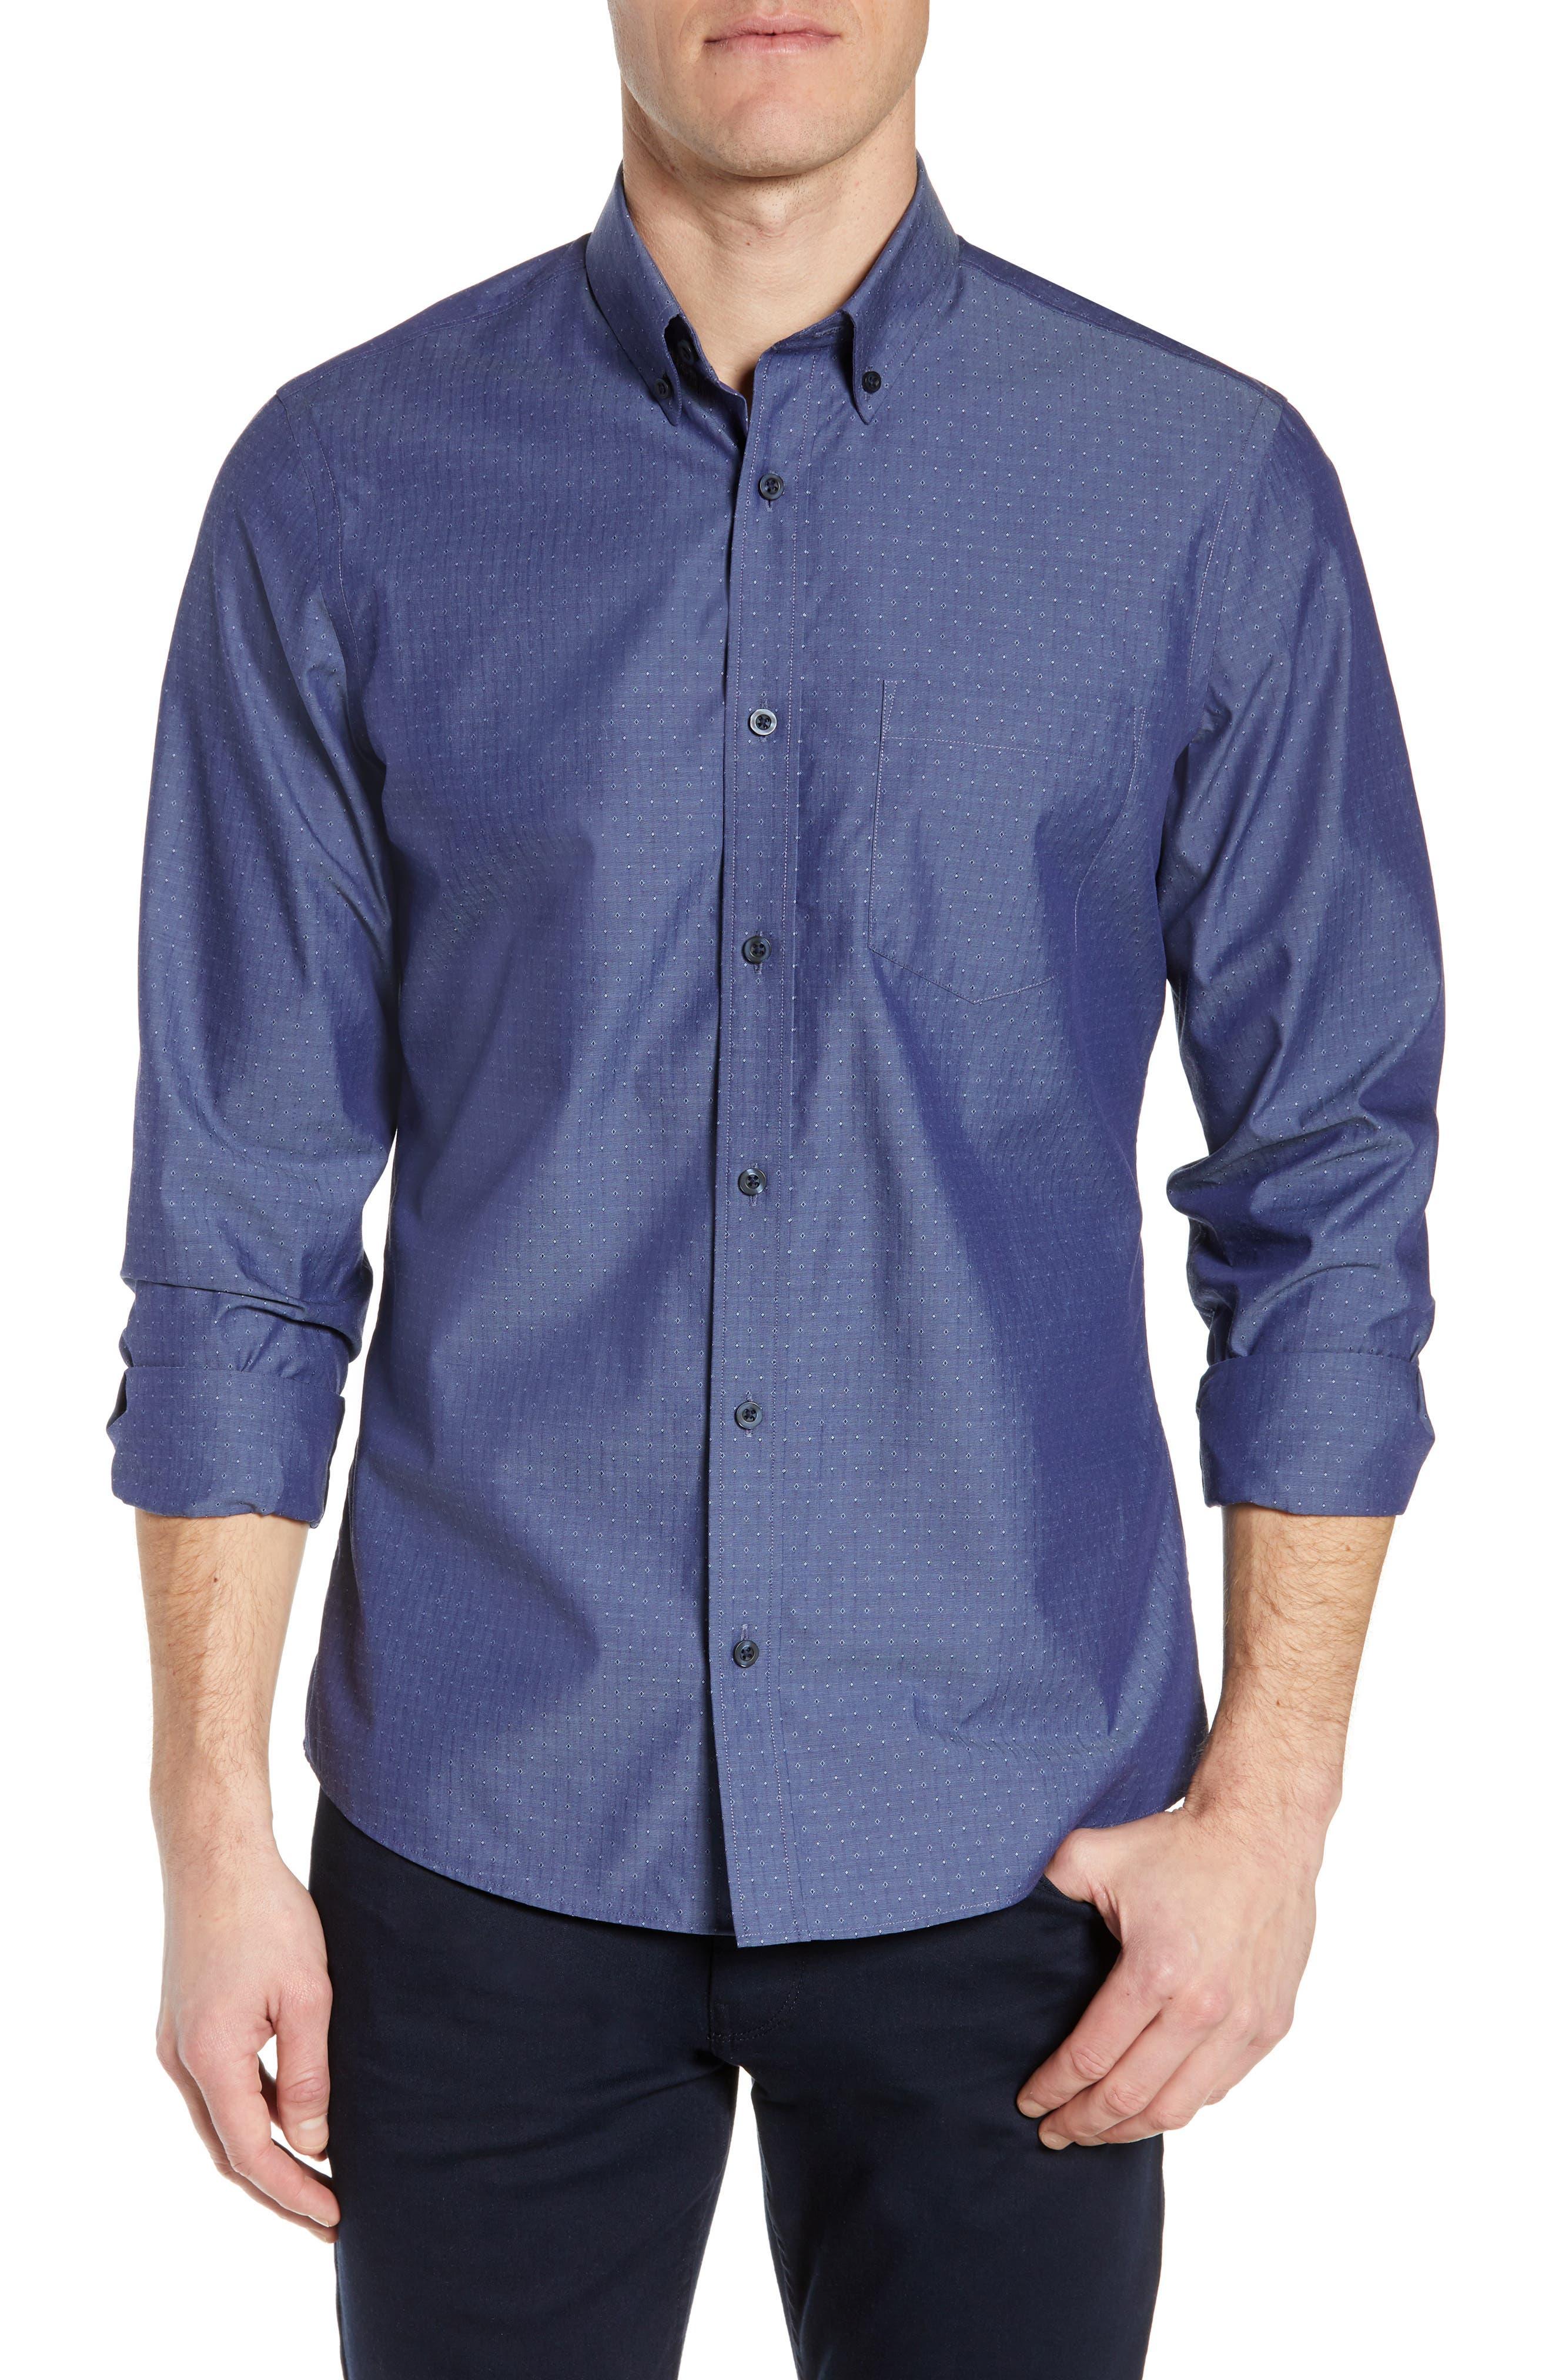 NORDSTROM MEN'S SHOP,                             Regular Fit Non-Iron Dobby Sport Shirt,                             Main thumbnail 1, color,                             NAVY PEACOAT DIAMOND DOBBY